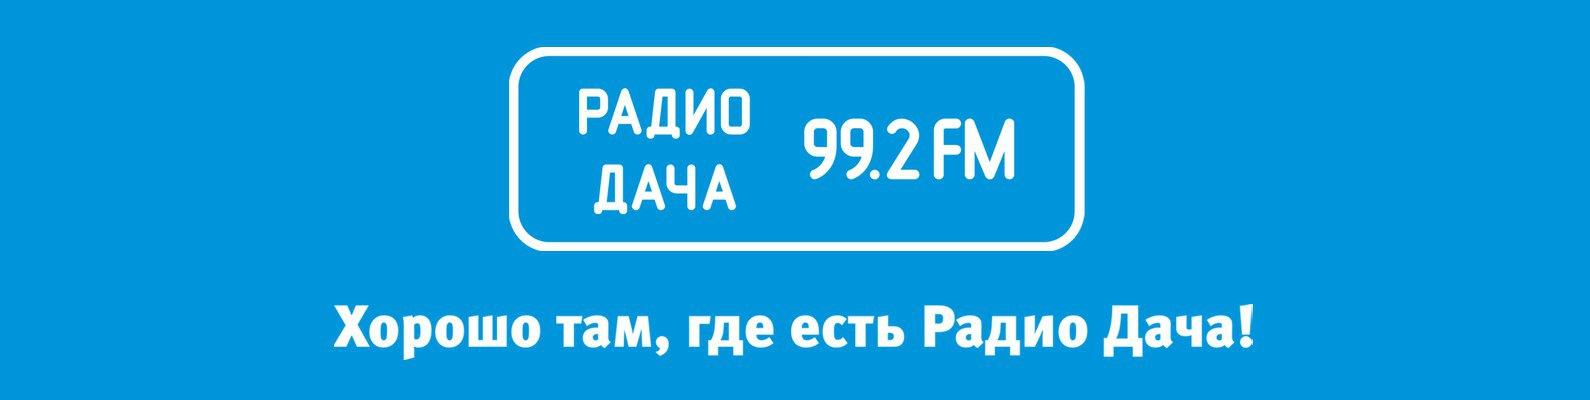 Радио дача | новости: мобильное приложение радио дача на android.